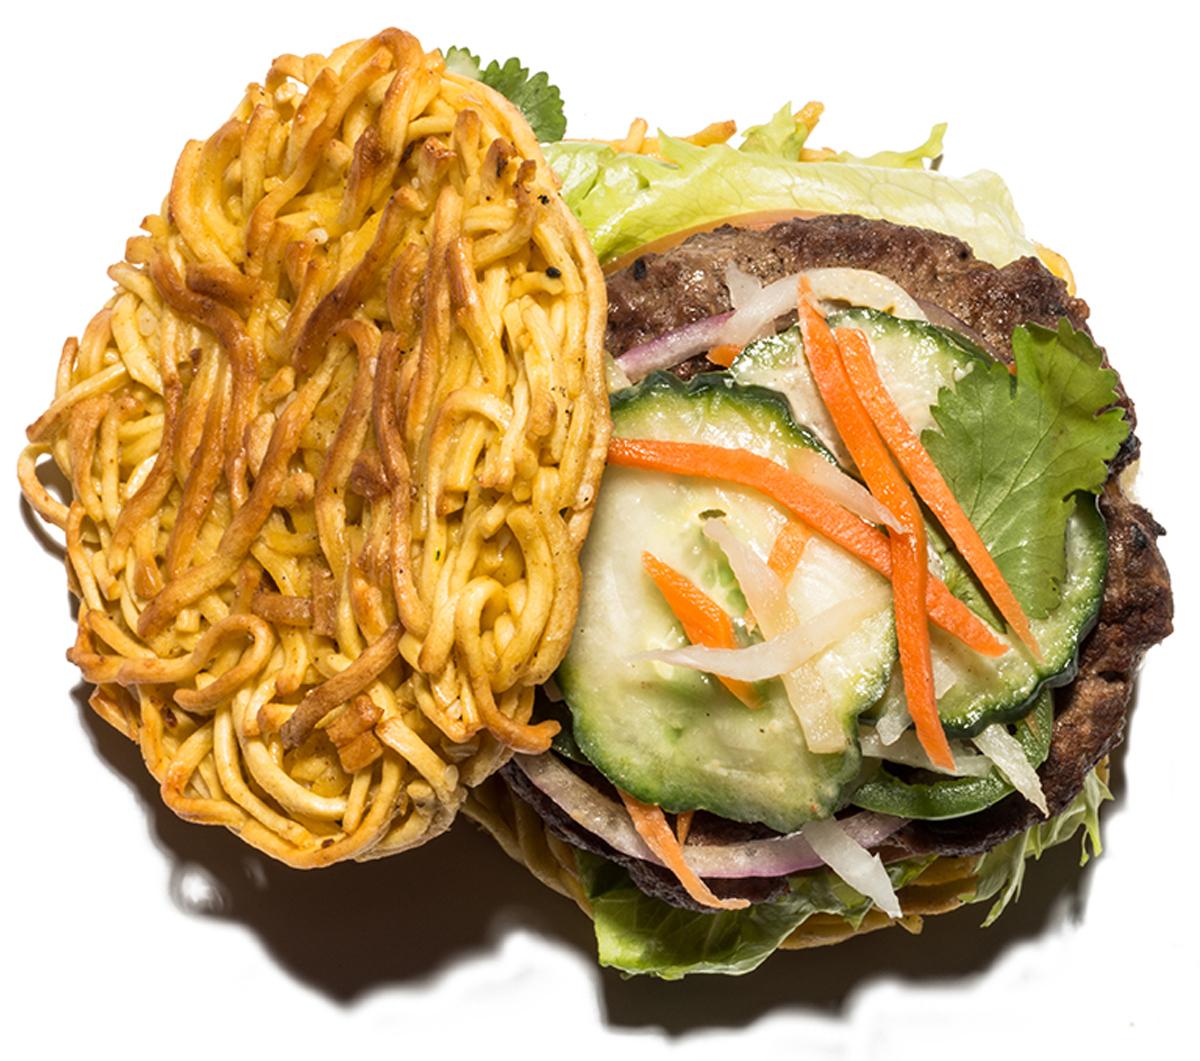 Ramen banh mi burger from Ki Bistro/All Photos by Toan Trinh